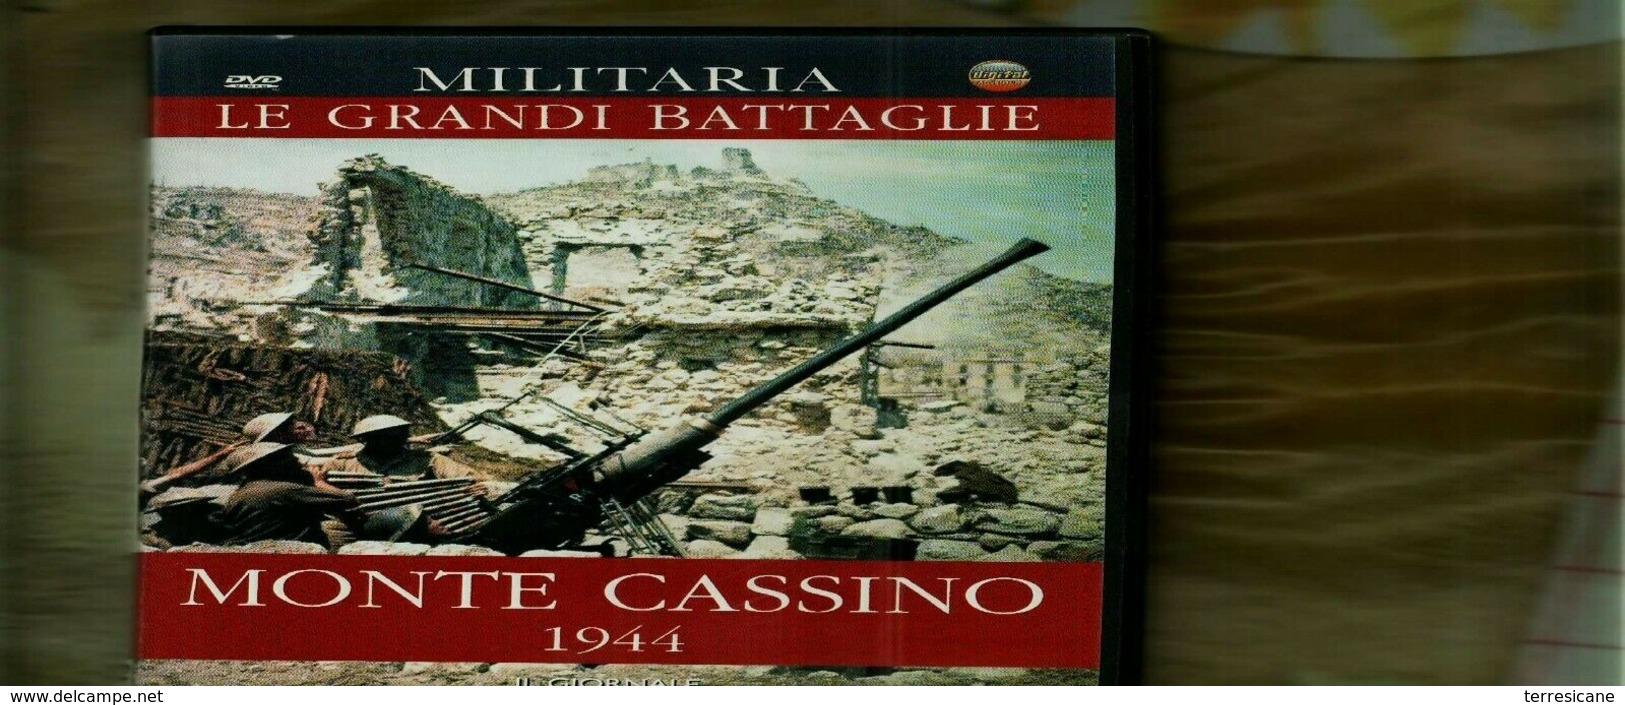 MILITARIA LE GRANDI BATTAGLIE MONTECASSINO - Storia